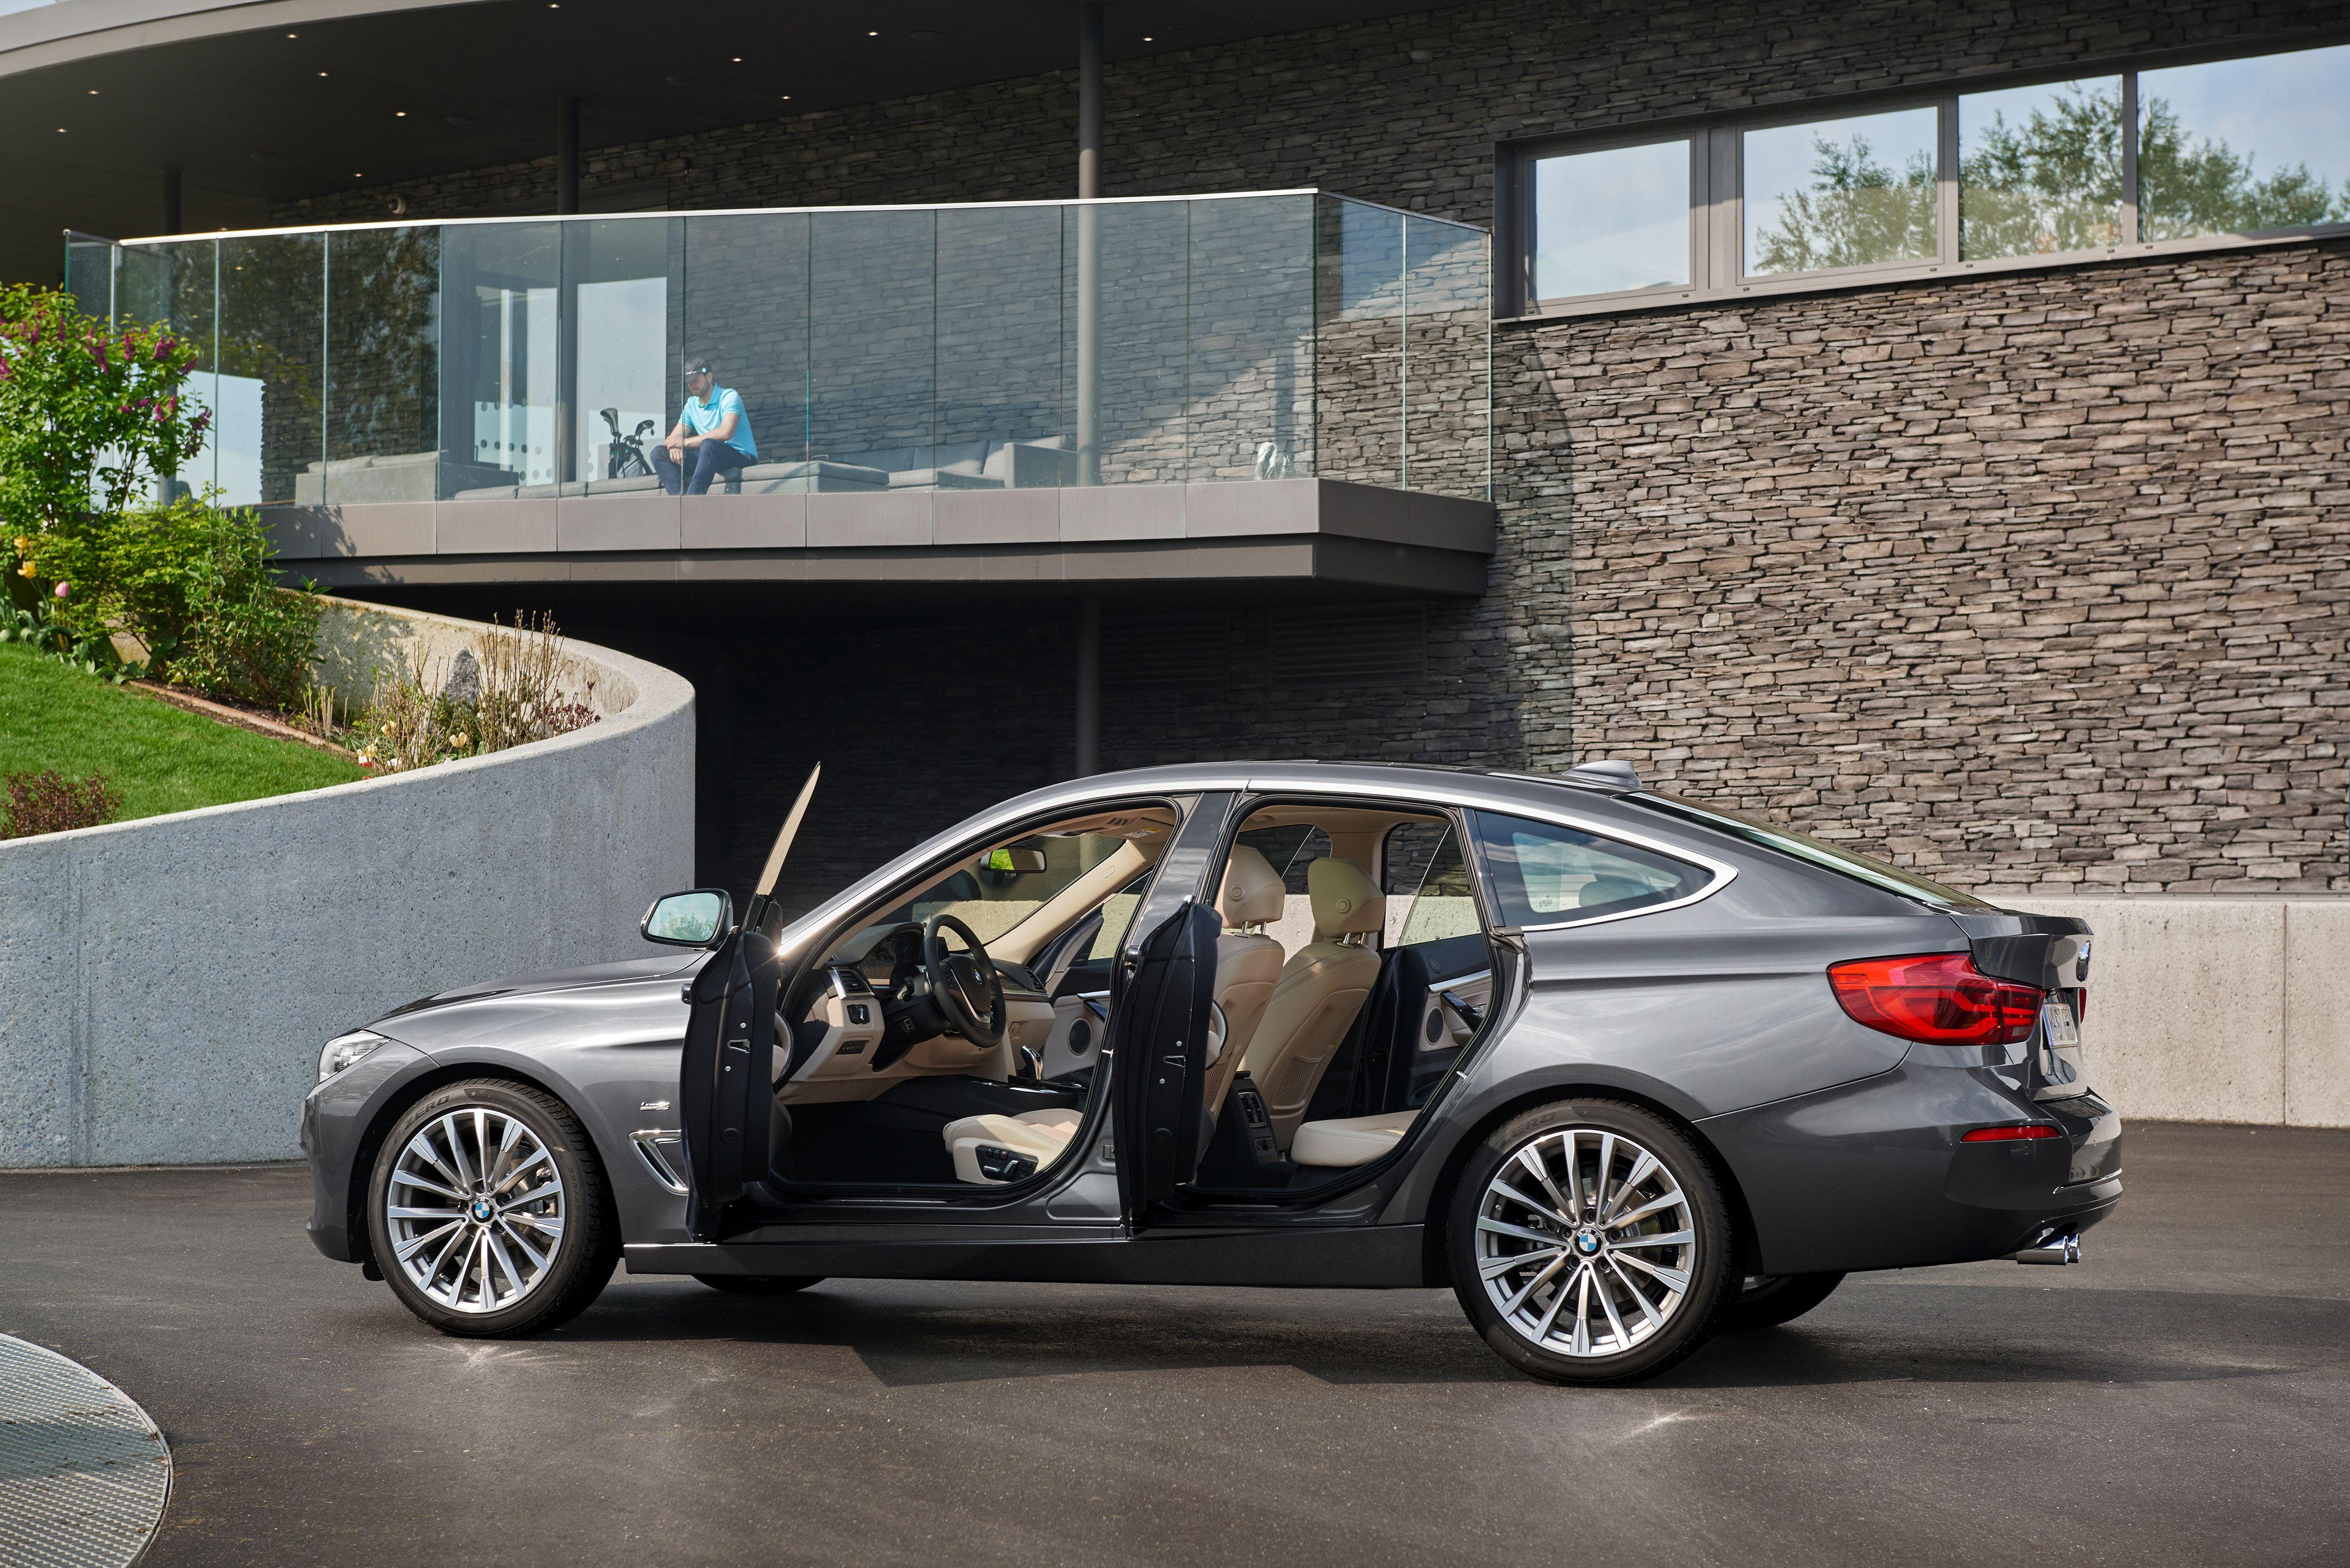 BMW F34 330i GranTurismo LuxuryLine Facelift FamilyCar Badass